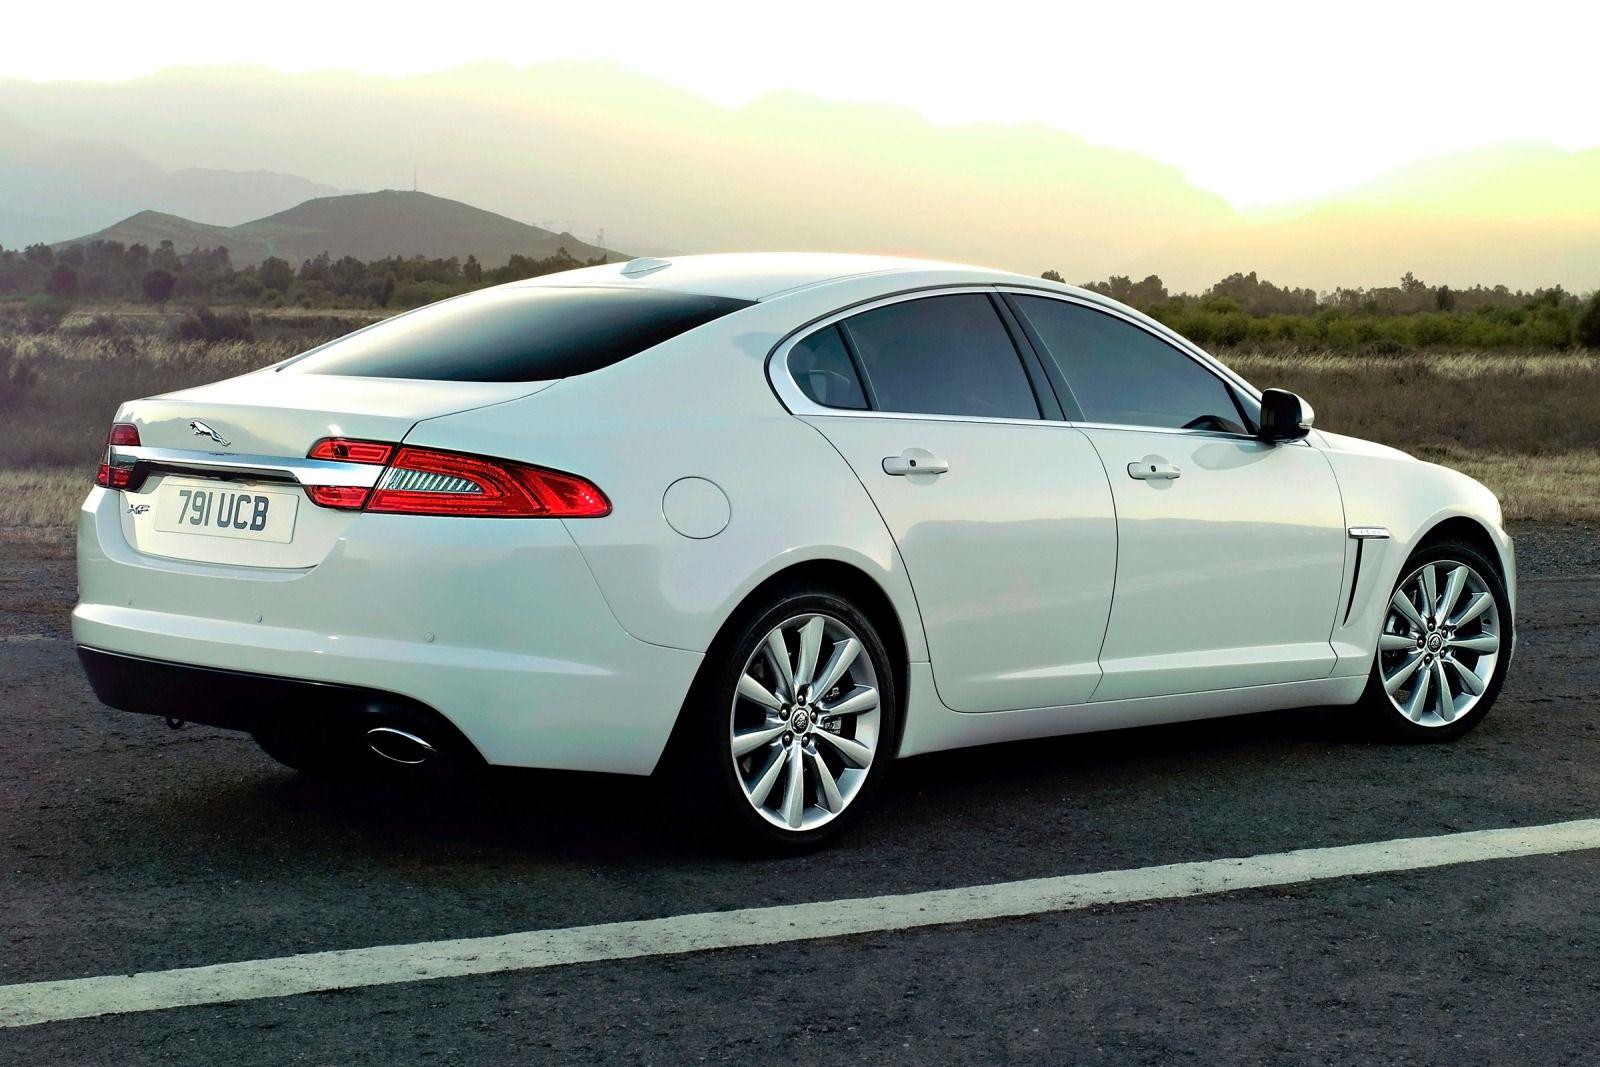 jaguar com car news awd genesis xf autoguide comparisons vs front hyundai